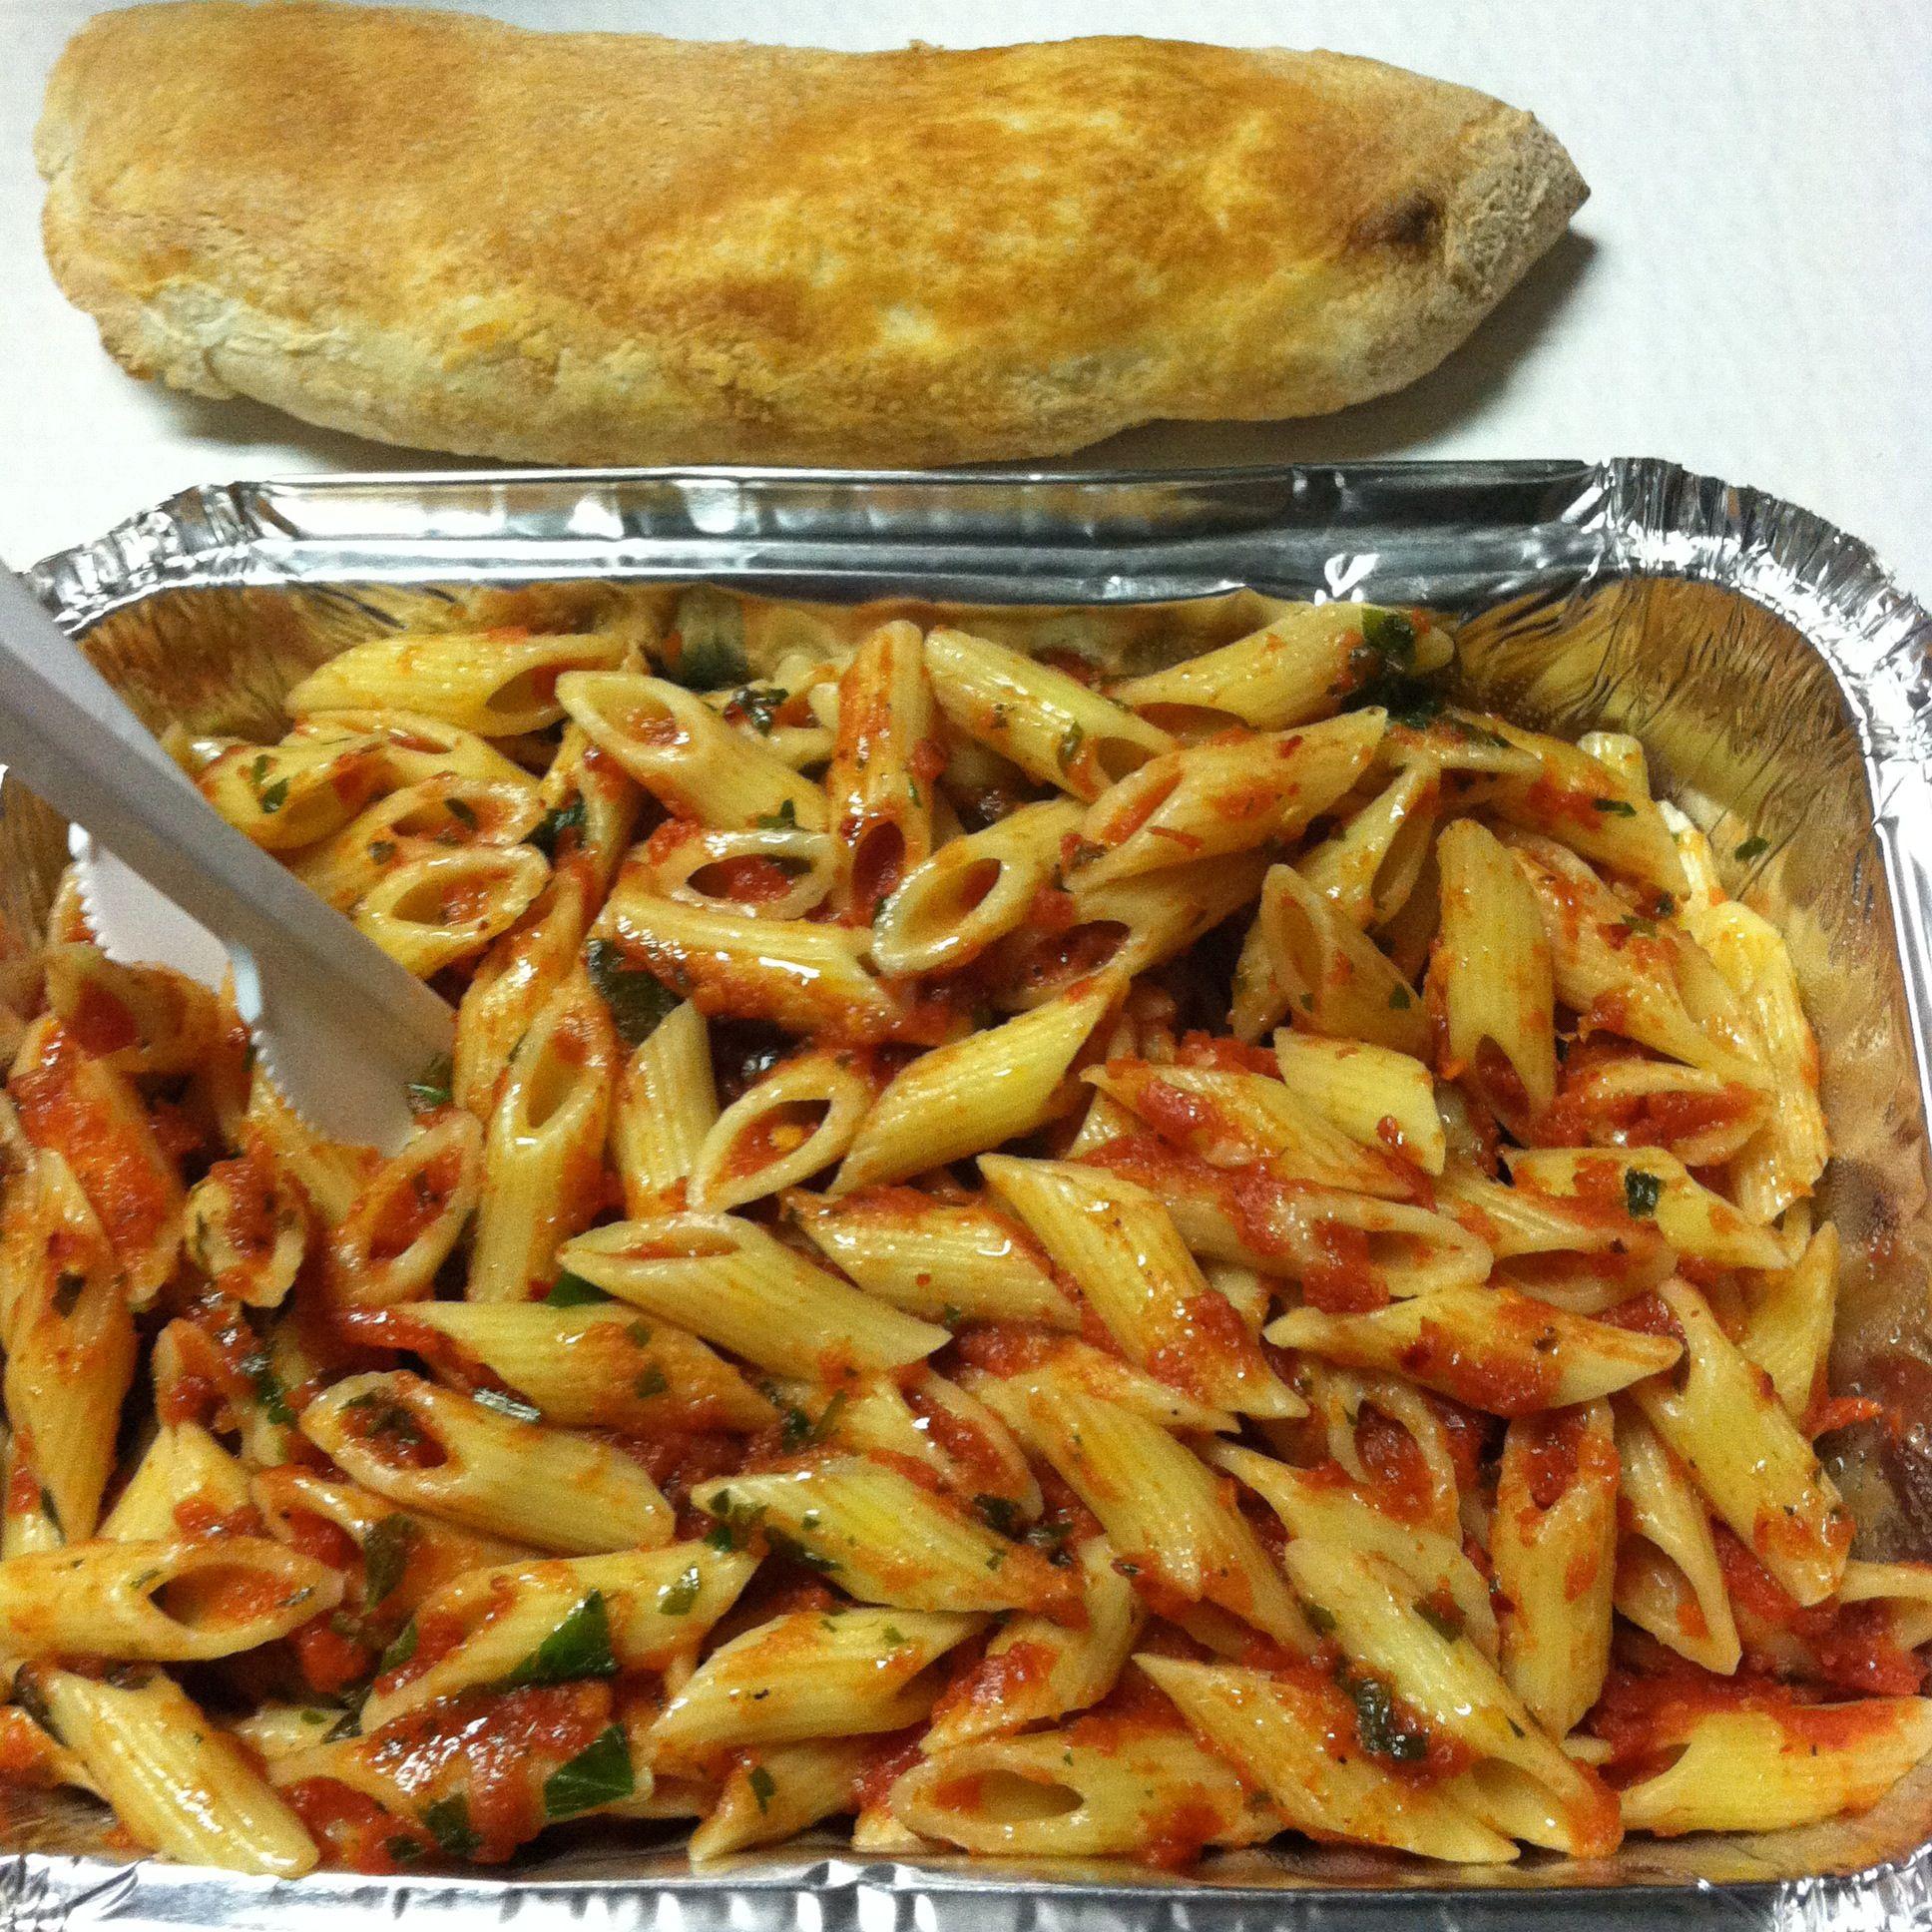 Spicy Penne pasta in Bologna, Italy | Allen & Carmen | Pinterest